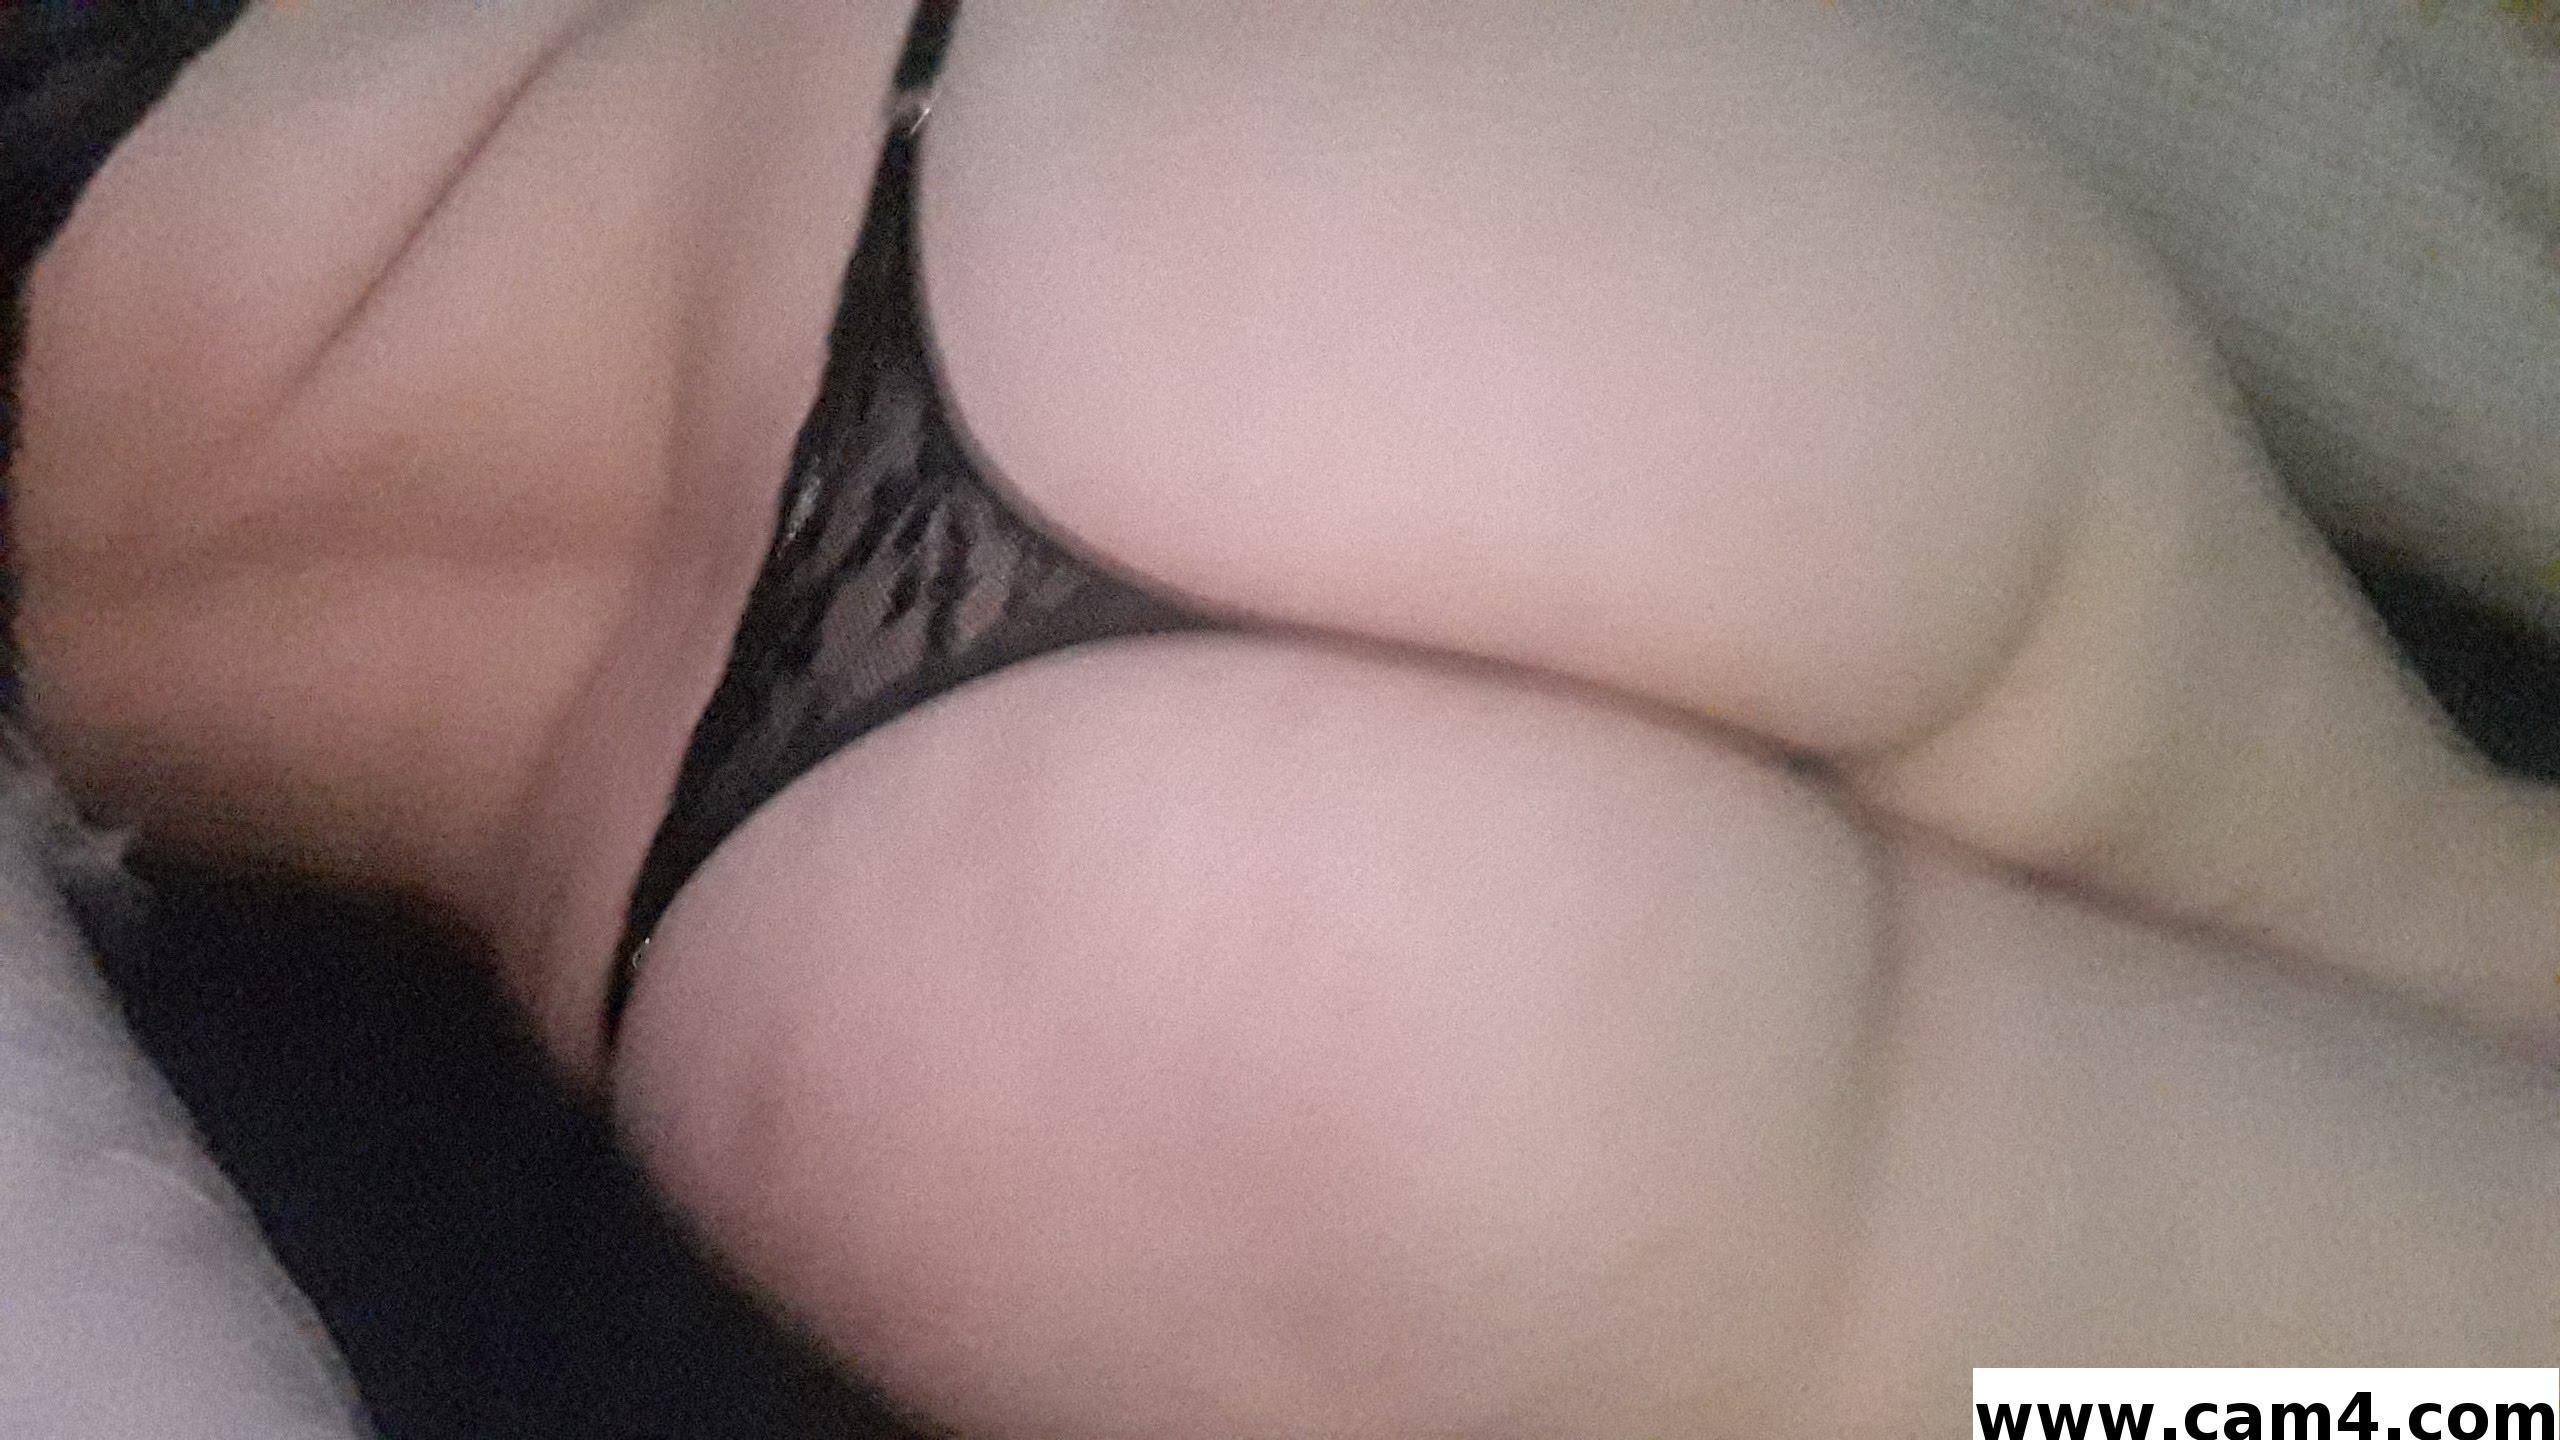 Martu sexy?s=vrv0verd4s+fnhx3ss1mjw1lb150k0padnvvw7z+2qg=